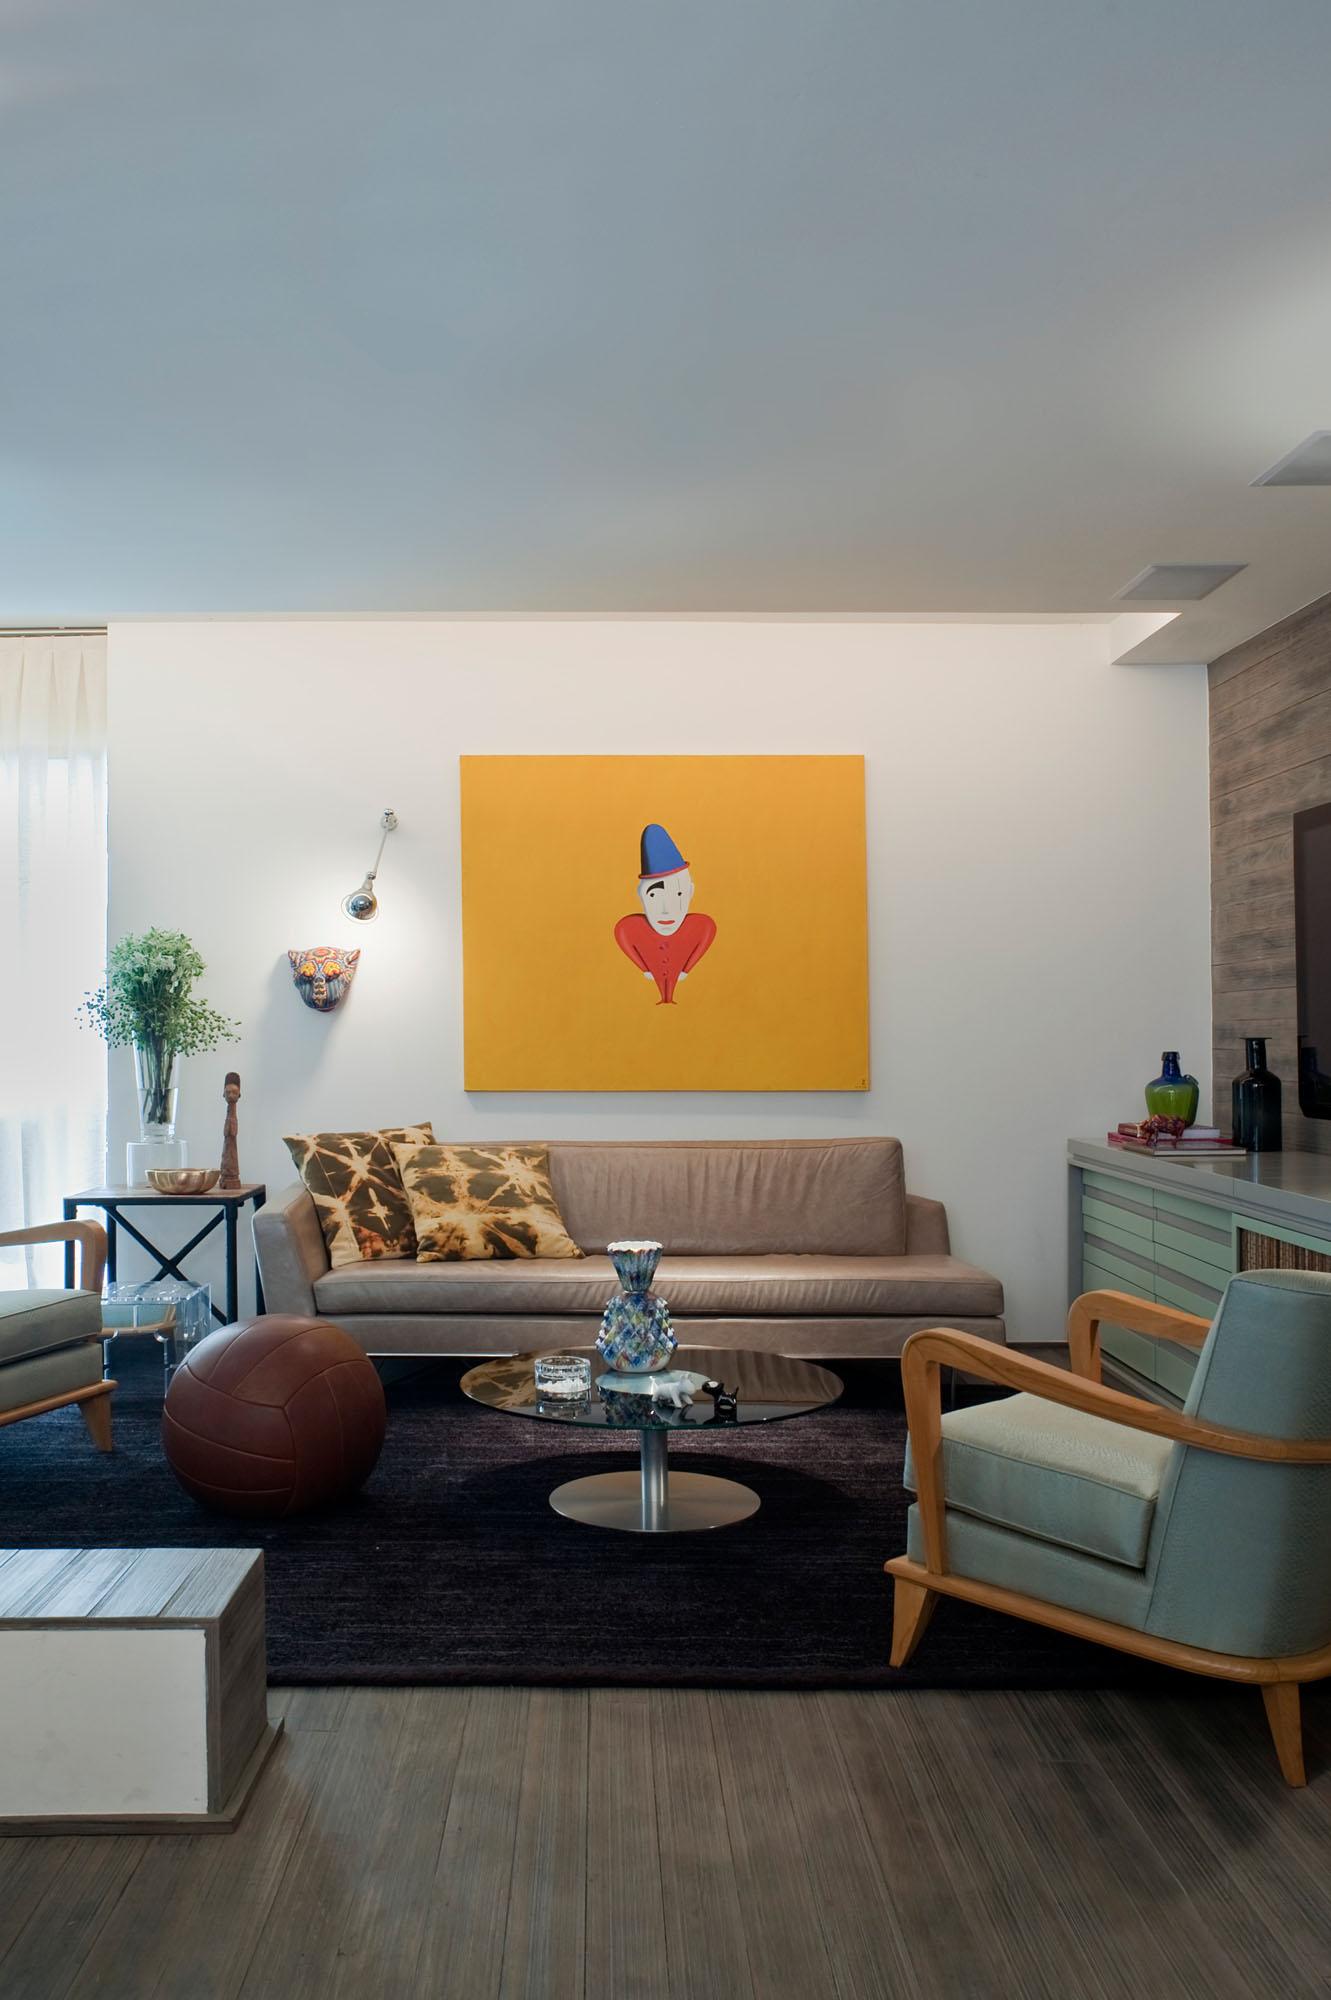 2013 Innovative Interior Design Tips My Decorative